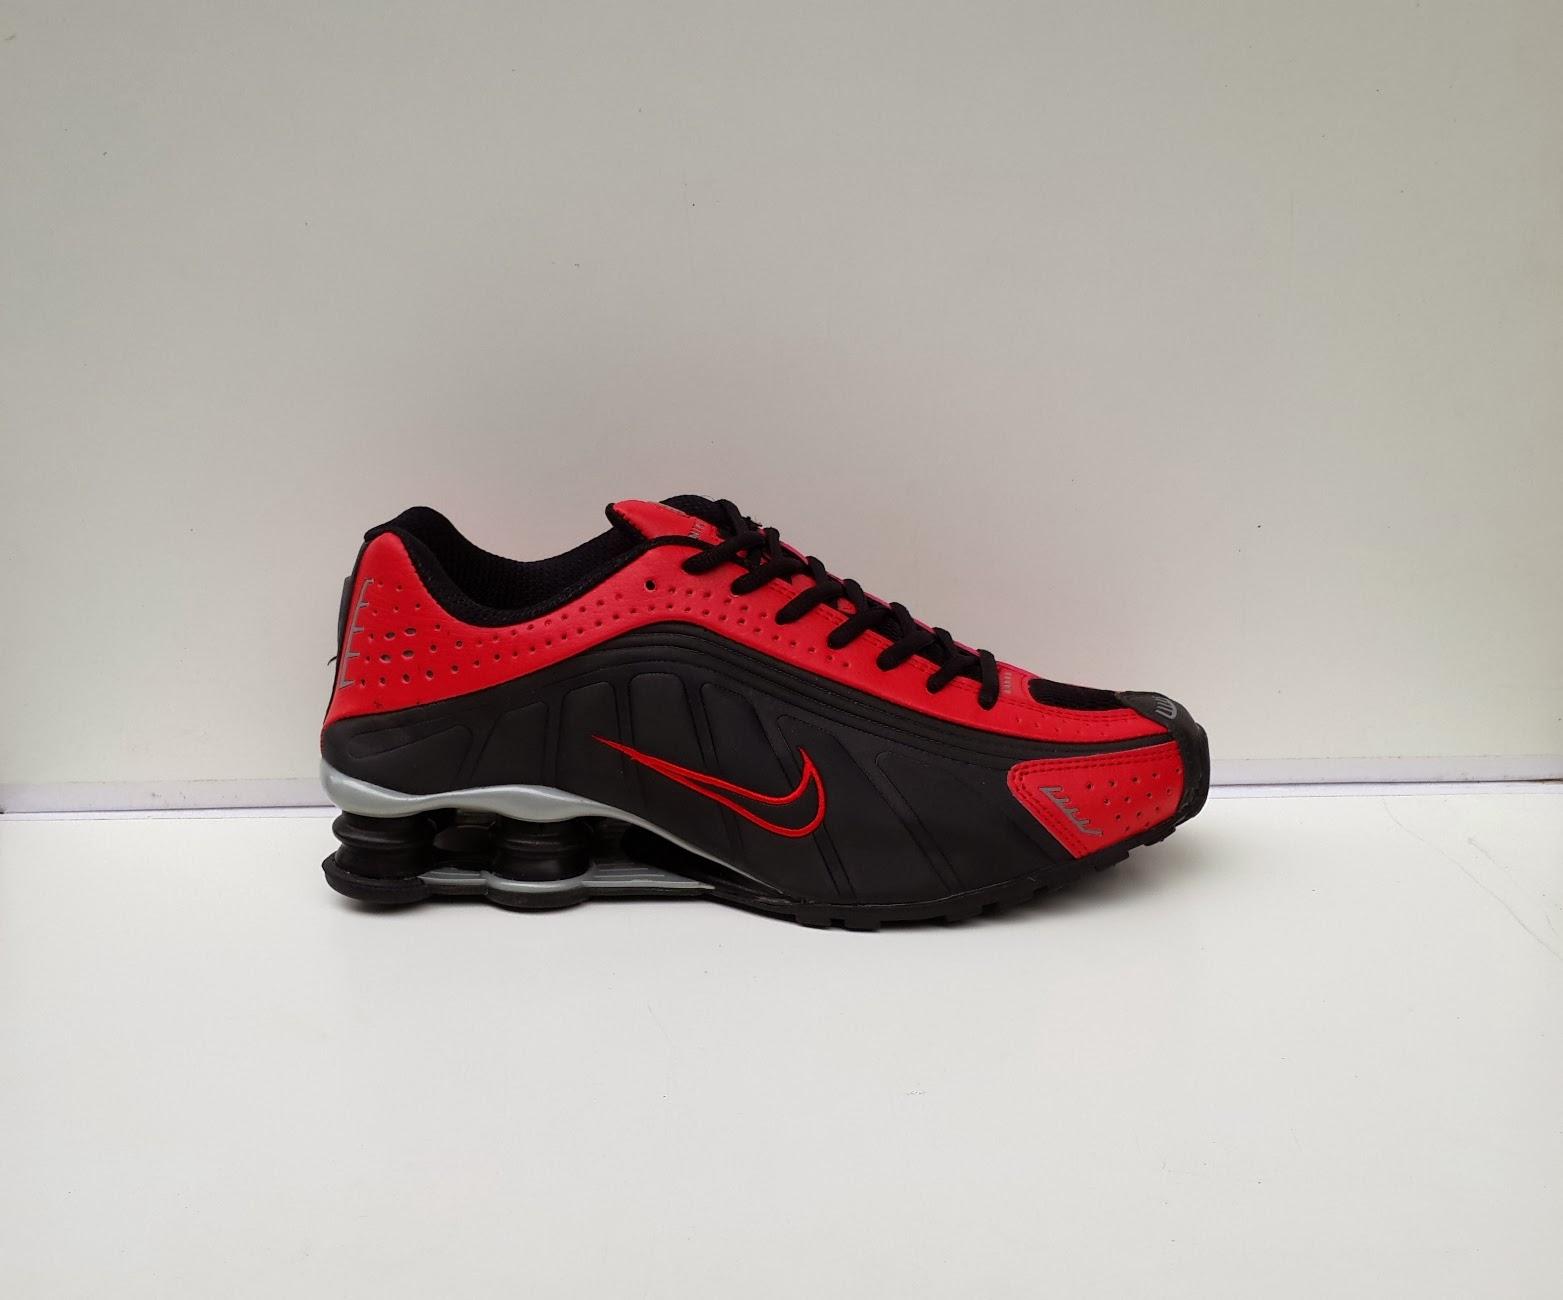 sepatu nike shox, sepatu nike running, nike murah, foto nike, photo nike, gambar nike baru